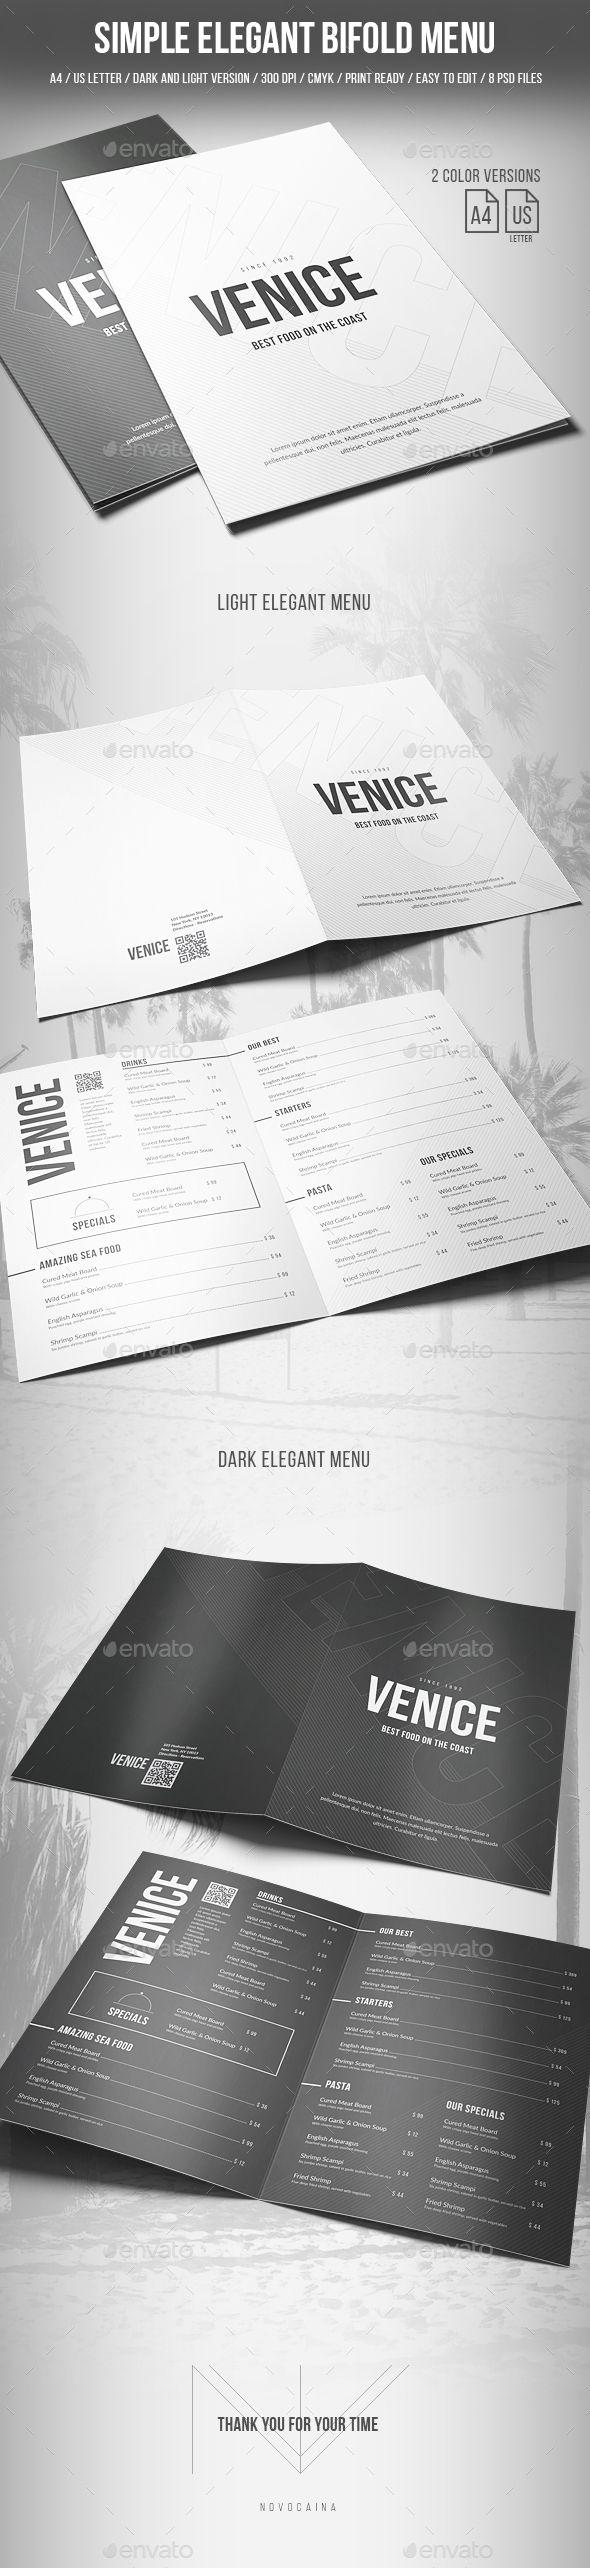 Simple Elegant Bifold Menu - A4 and US Letter - 2 Color Version ...